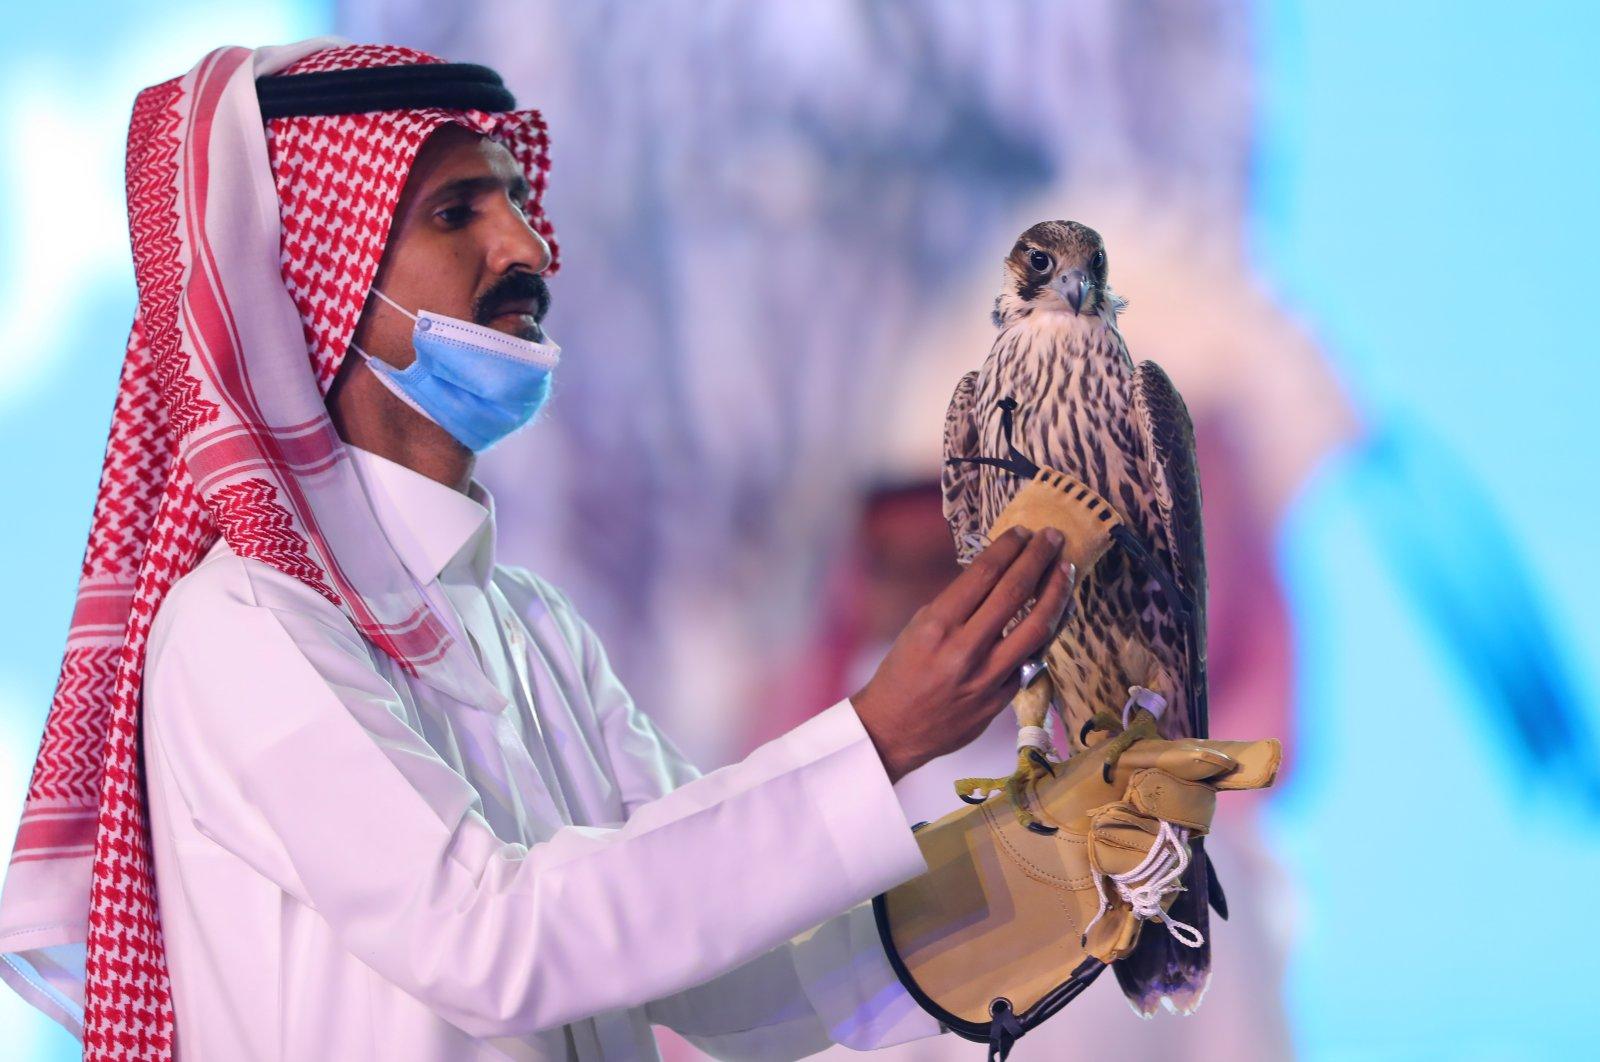 A man displays a falcon which was sold for $173,000 during Saudi Falcons Club Auction in King Abdulaziz Festival in Mulham, north of Riyadh, Saudi Arabia, Oct. 13, 2020. (Media Center Saudi Falcons Club Auction via Reuters)